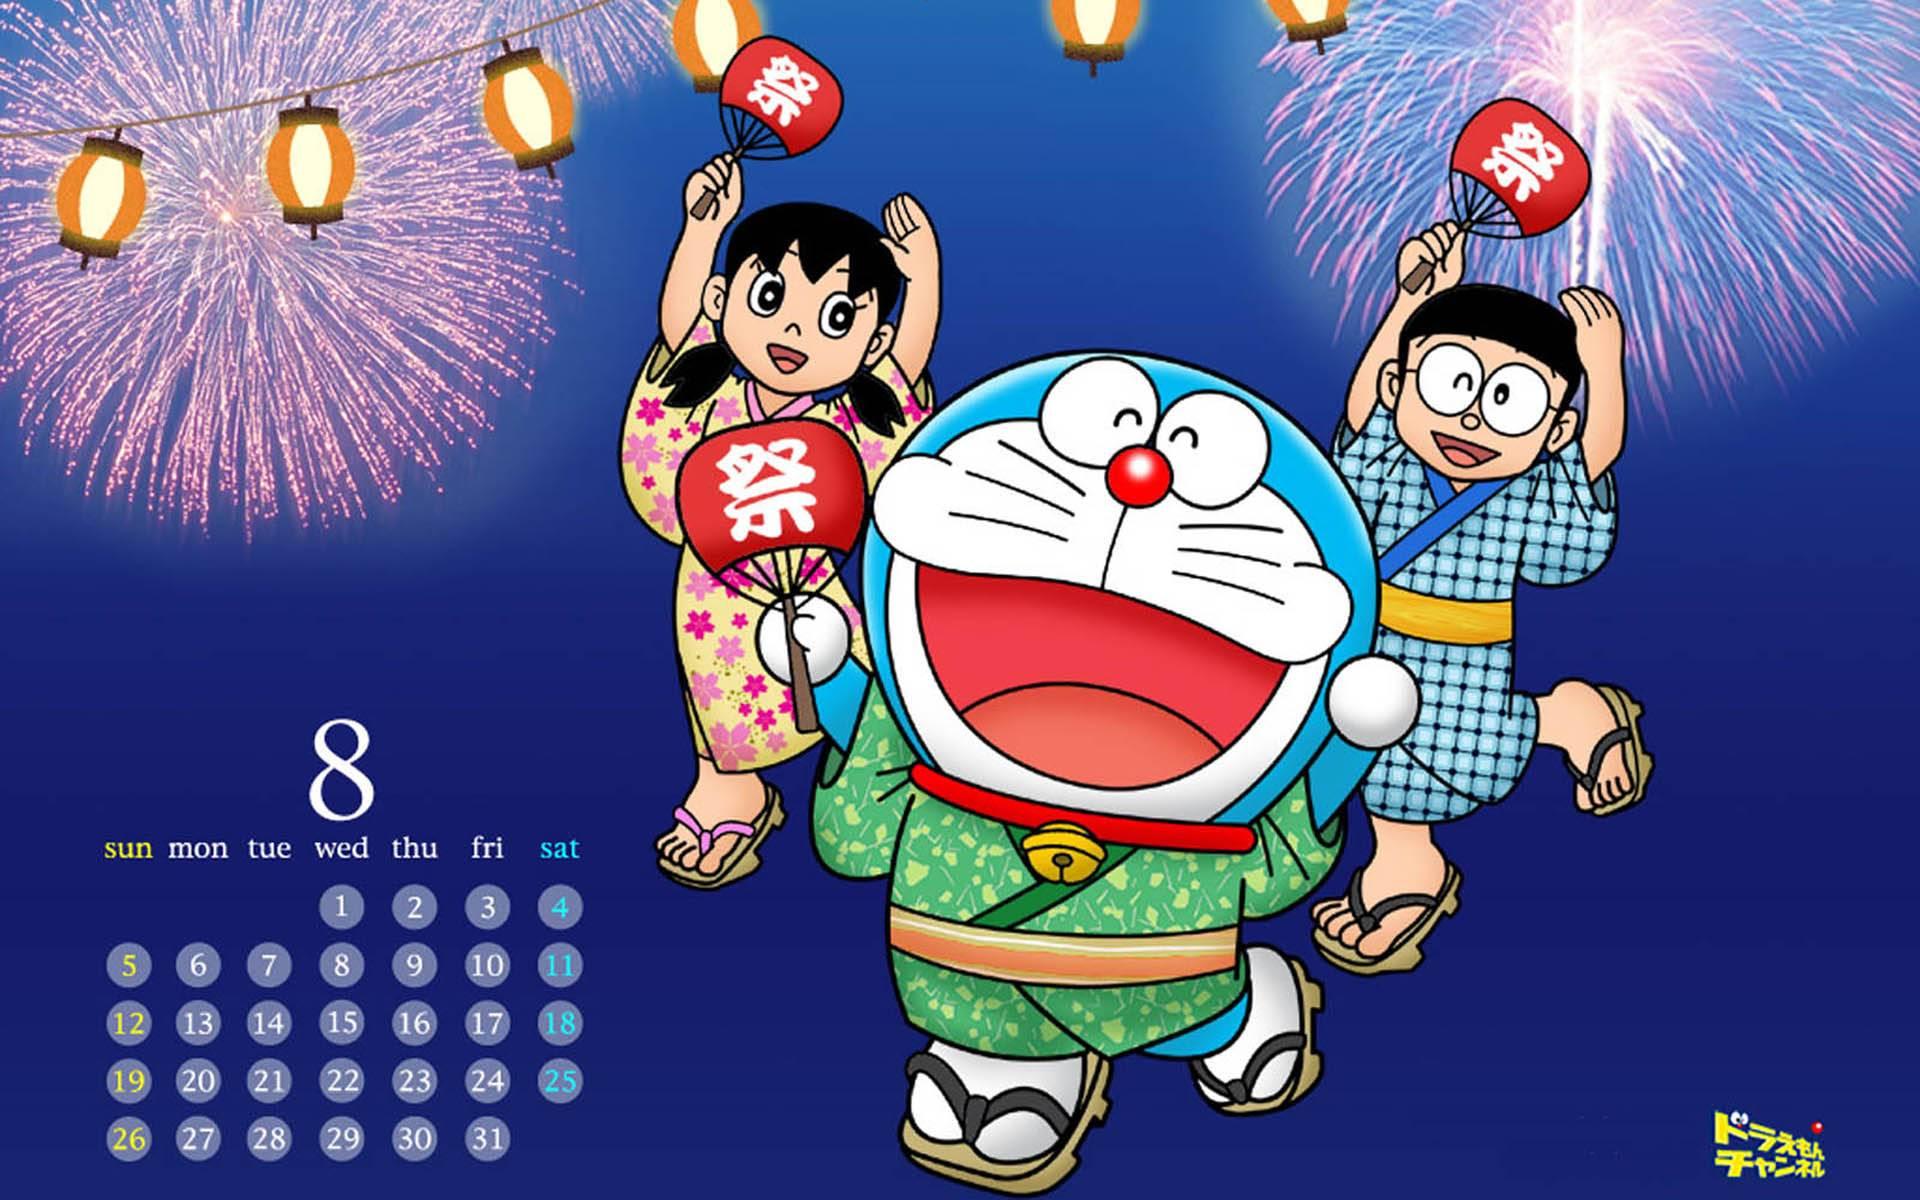 Doraemon 3d Wallpaper Hd - Free Android Application - Createapk.com